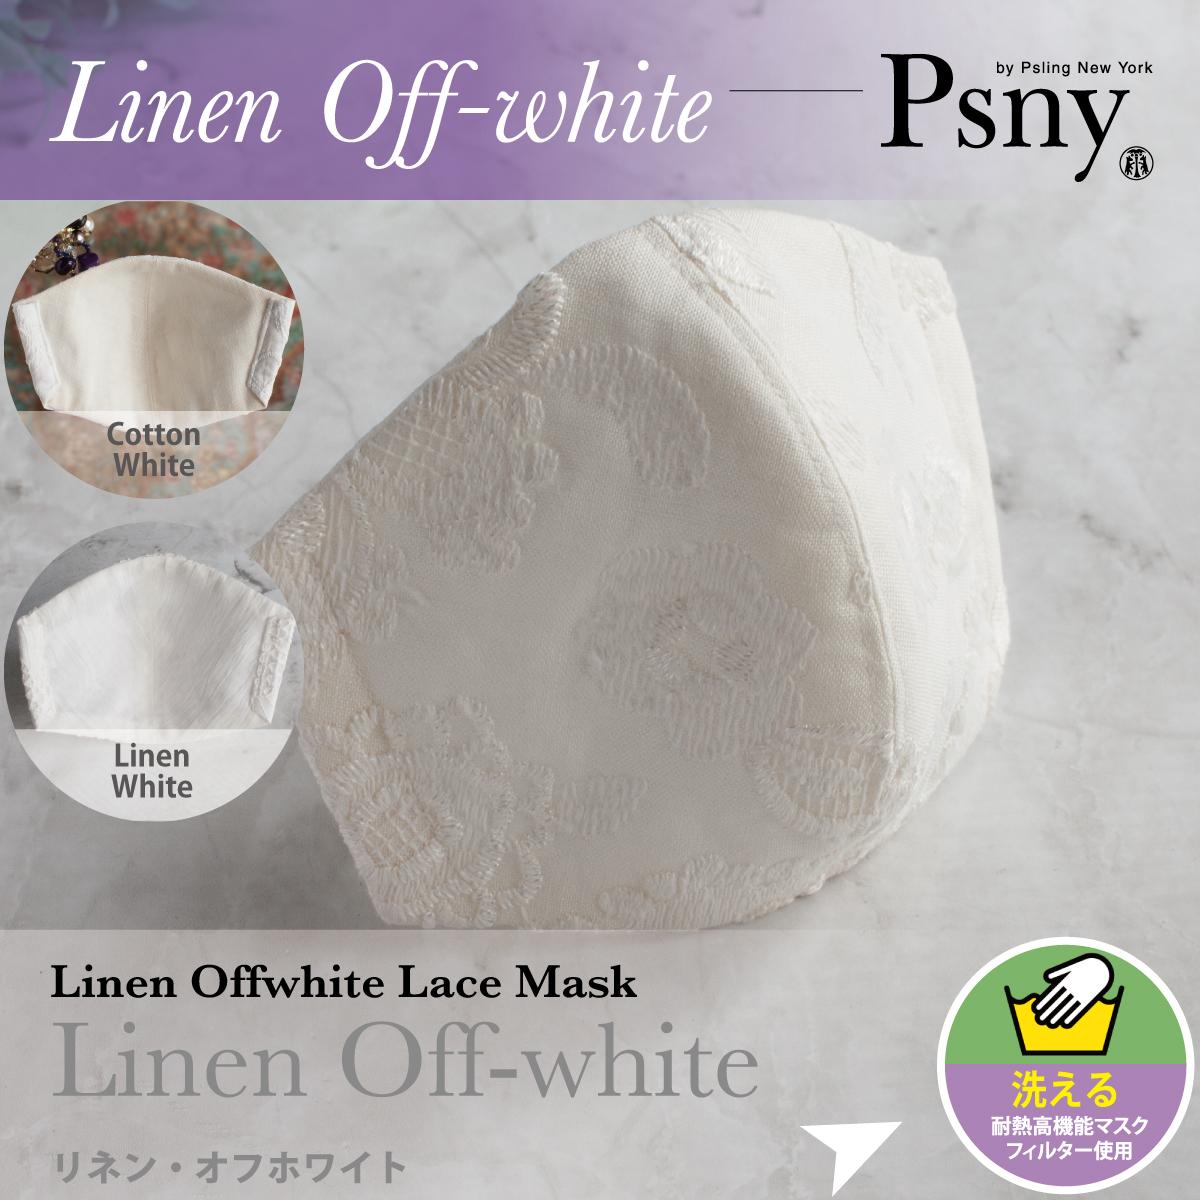 PSNY レース リネン 花粉 黄砂 洗える不織布フィルター入り 立体 大人用 マスク 送料無料 L52